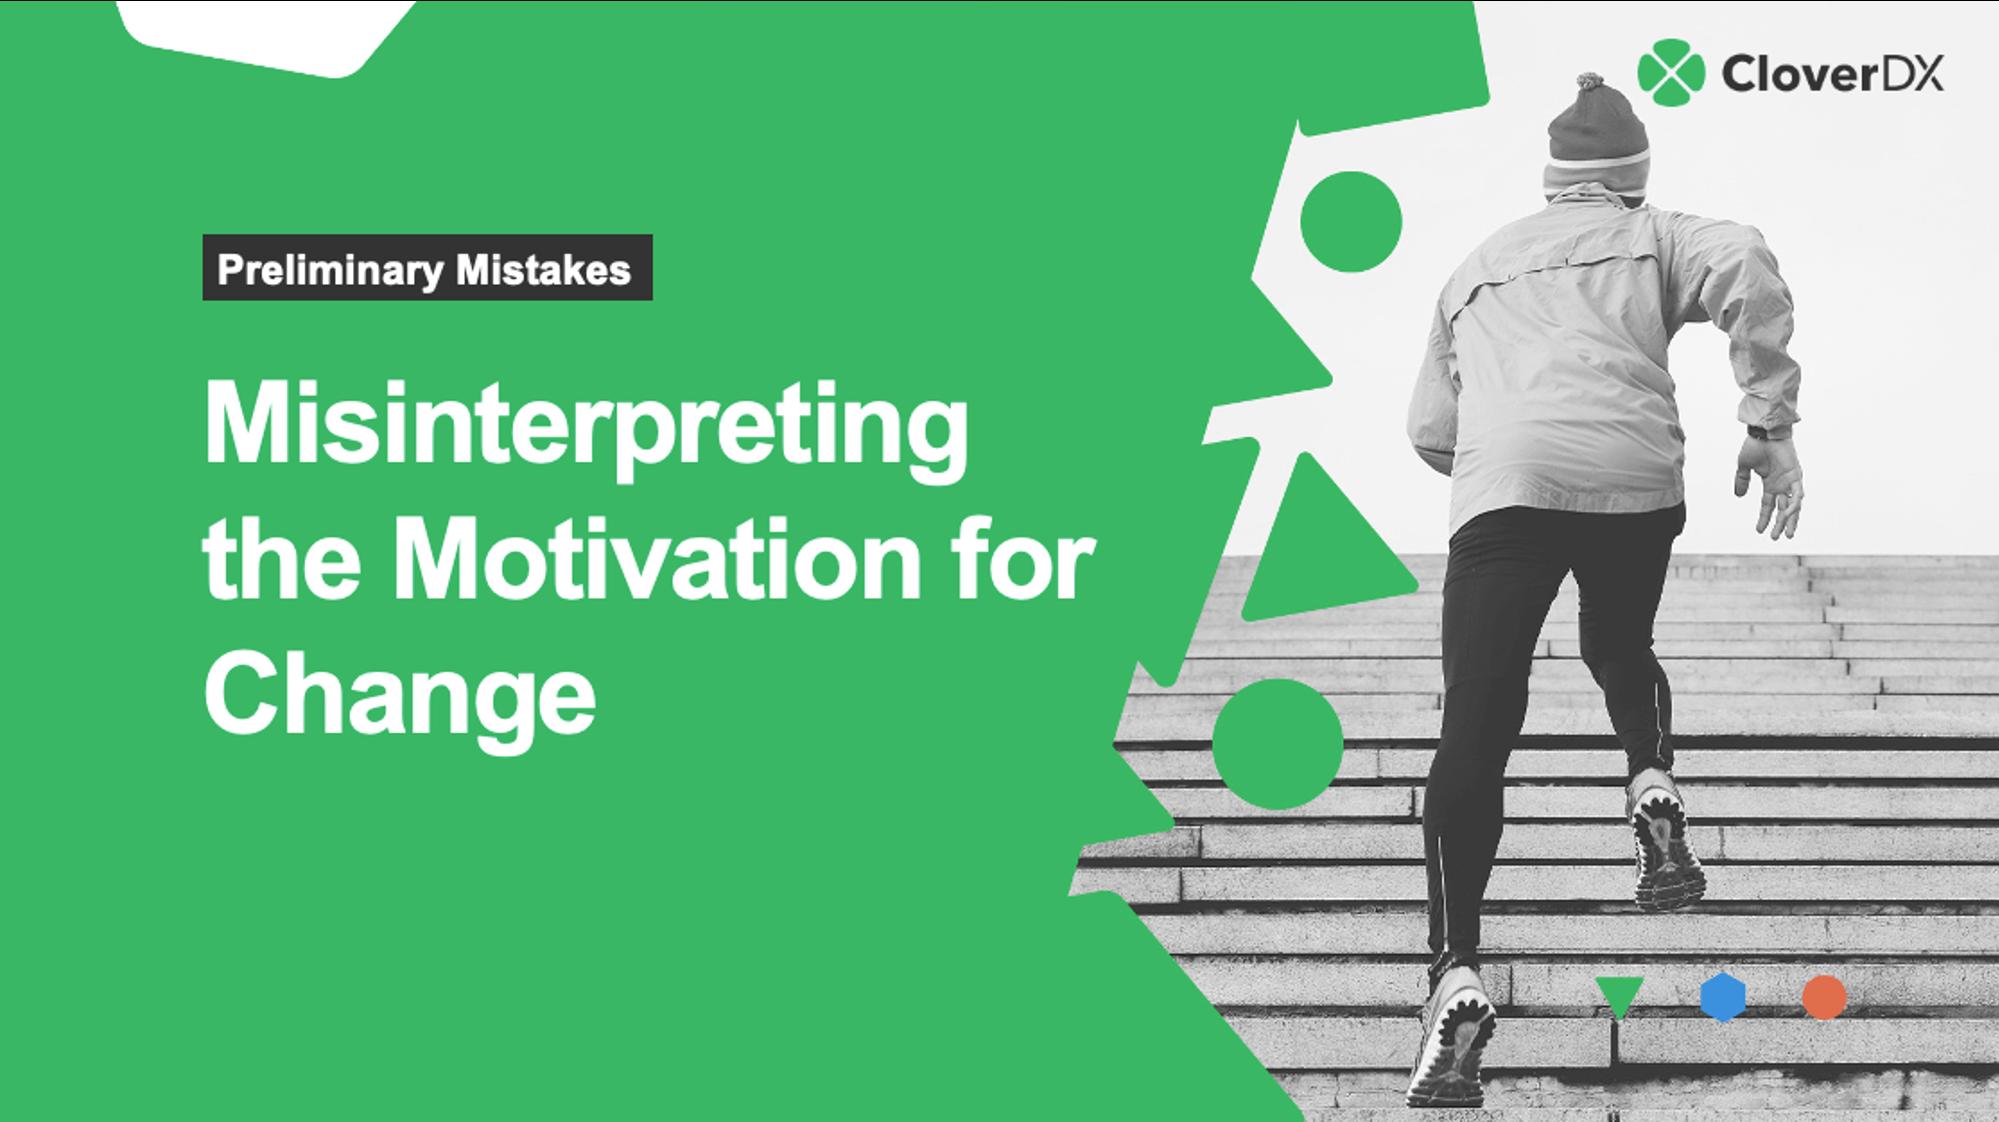 misinterpreting motivation for change